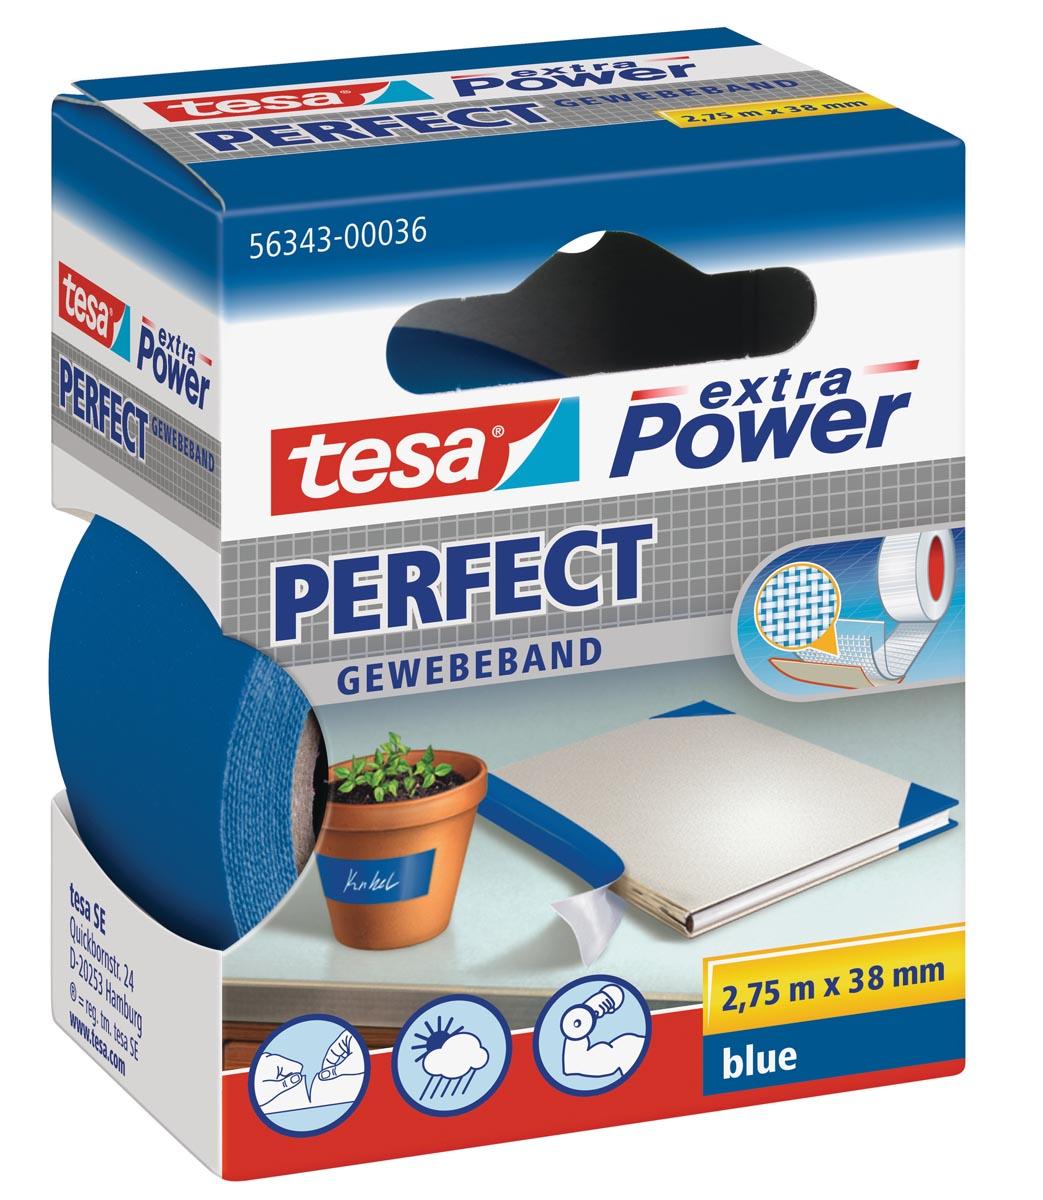 Tesa extra Power Perfect, ft 38 mm x 2,75 m, blauw